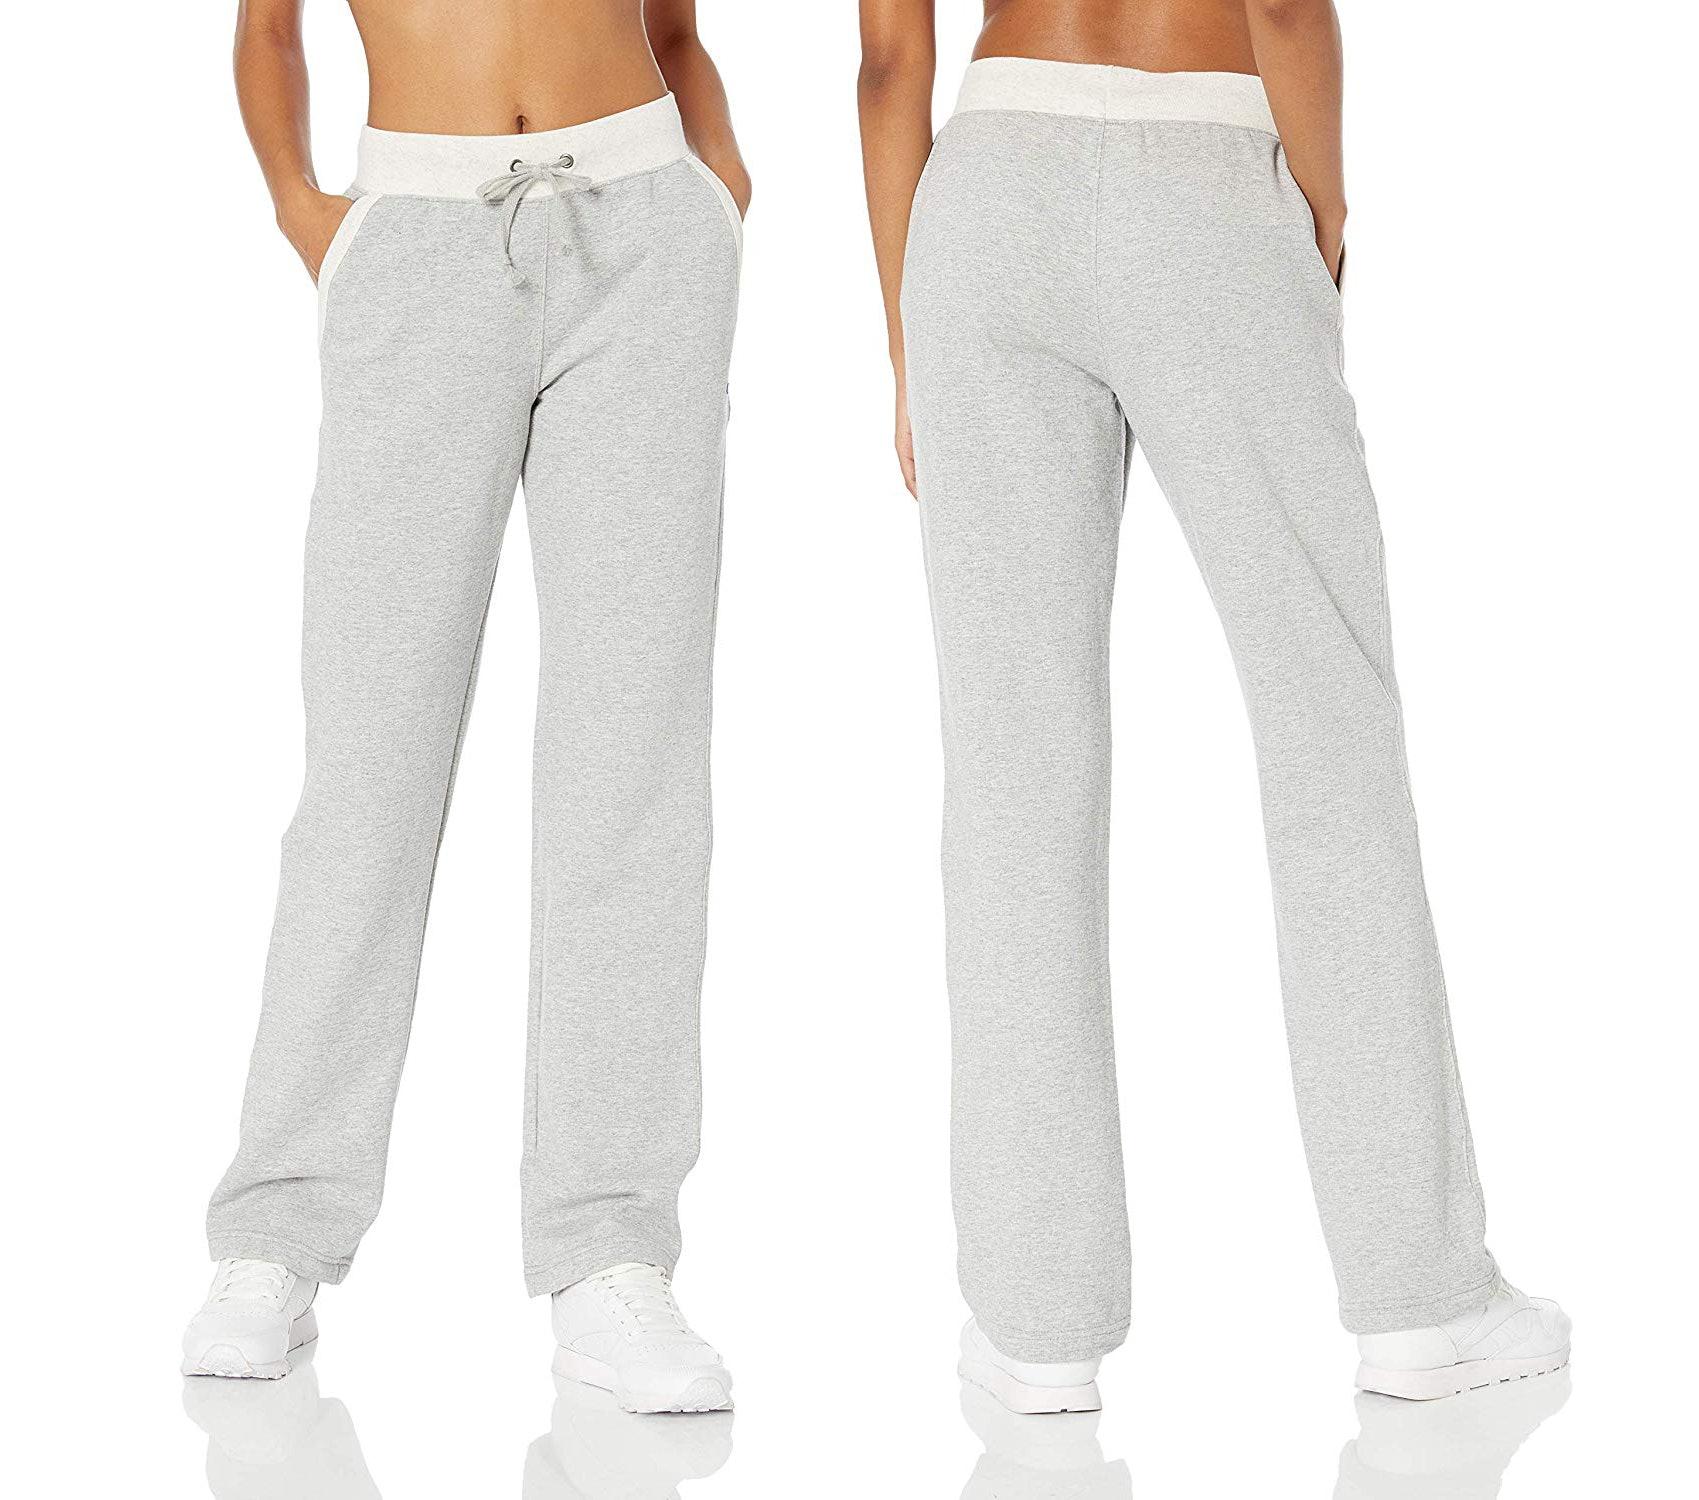 Champion Sweats Athletic Pants Boys Large Black Open Bottom